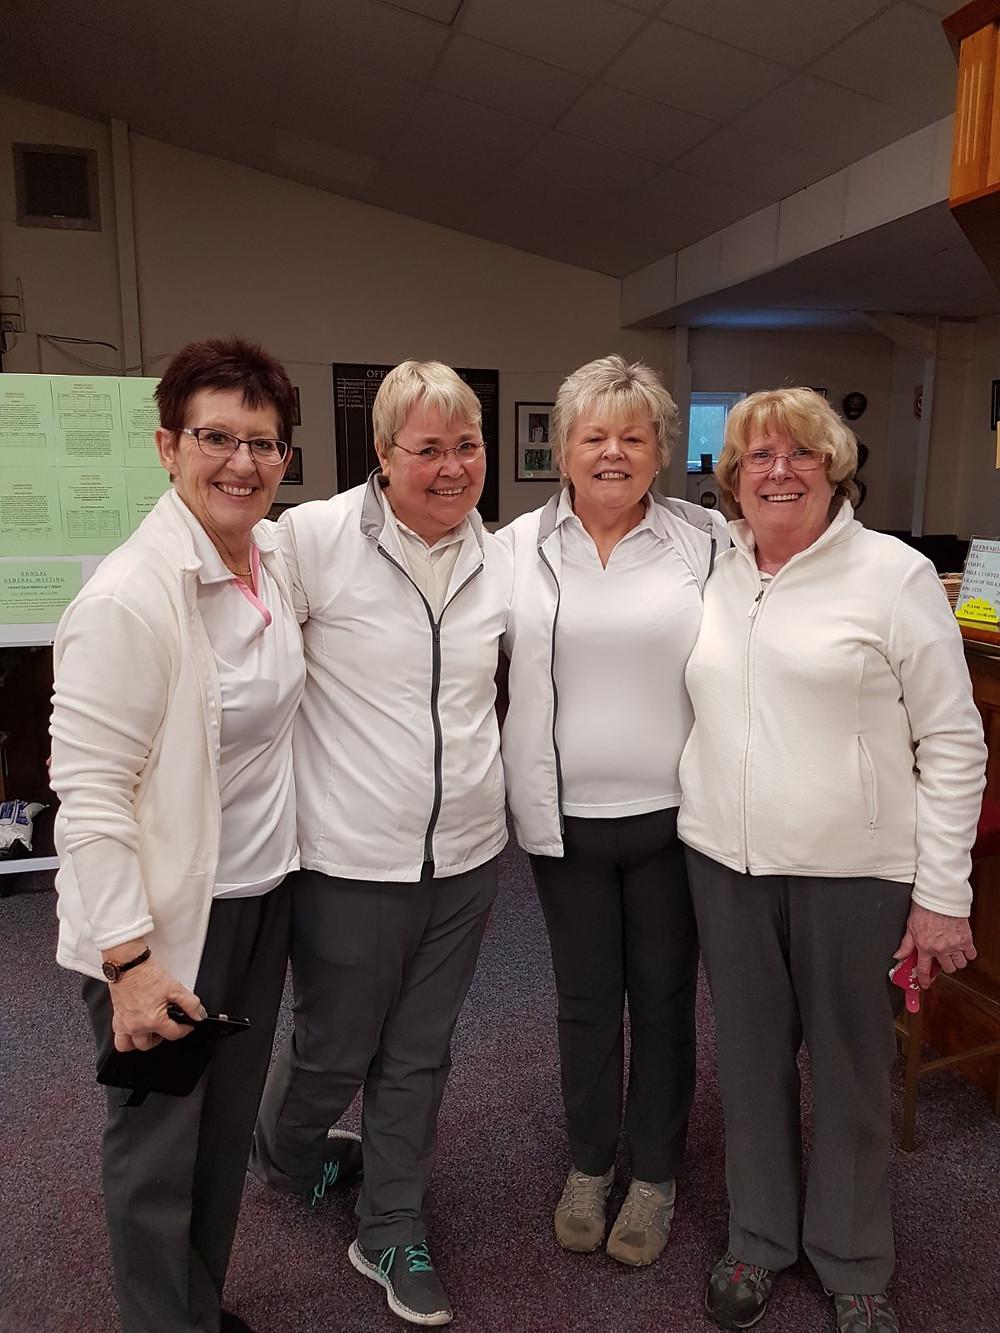 Winning Ladies: Anna Naughton, Vanessa Gant, Sheila Bastow & Jenny Woolley